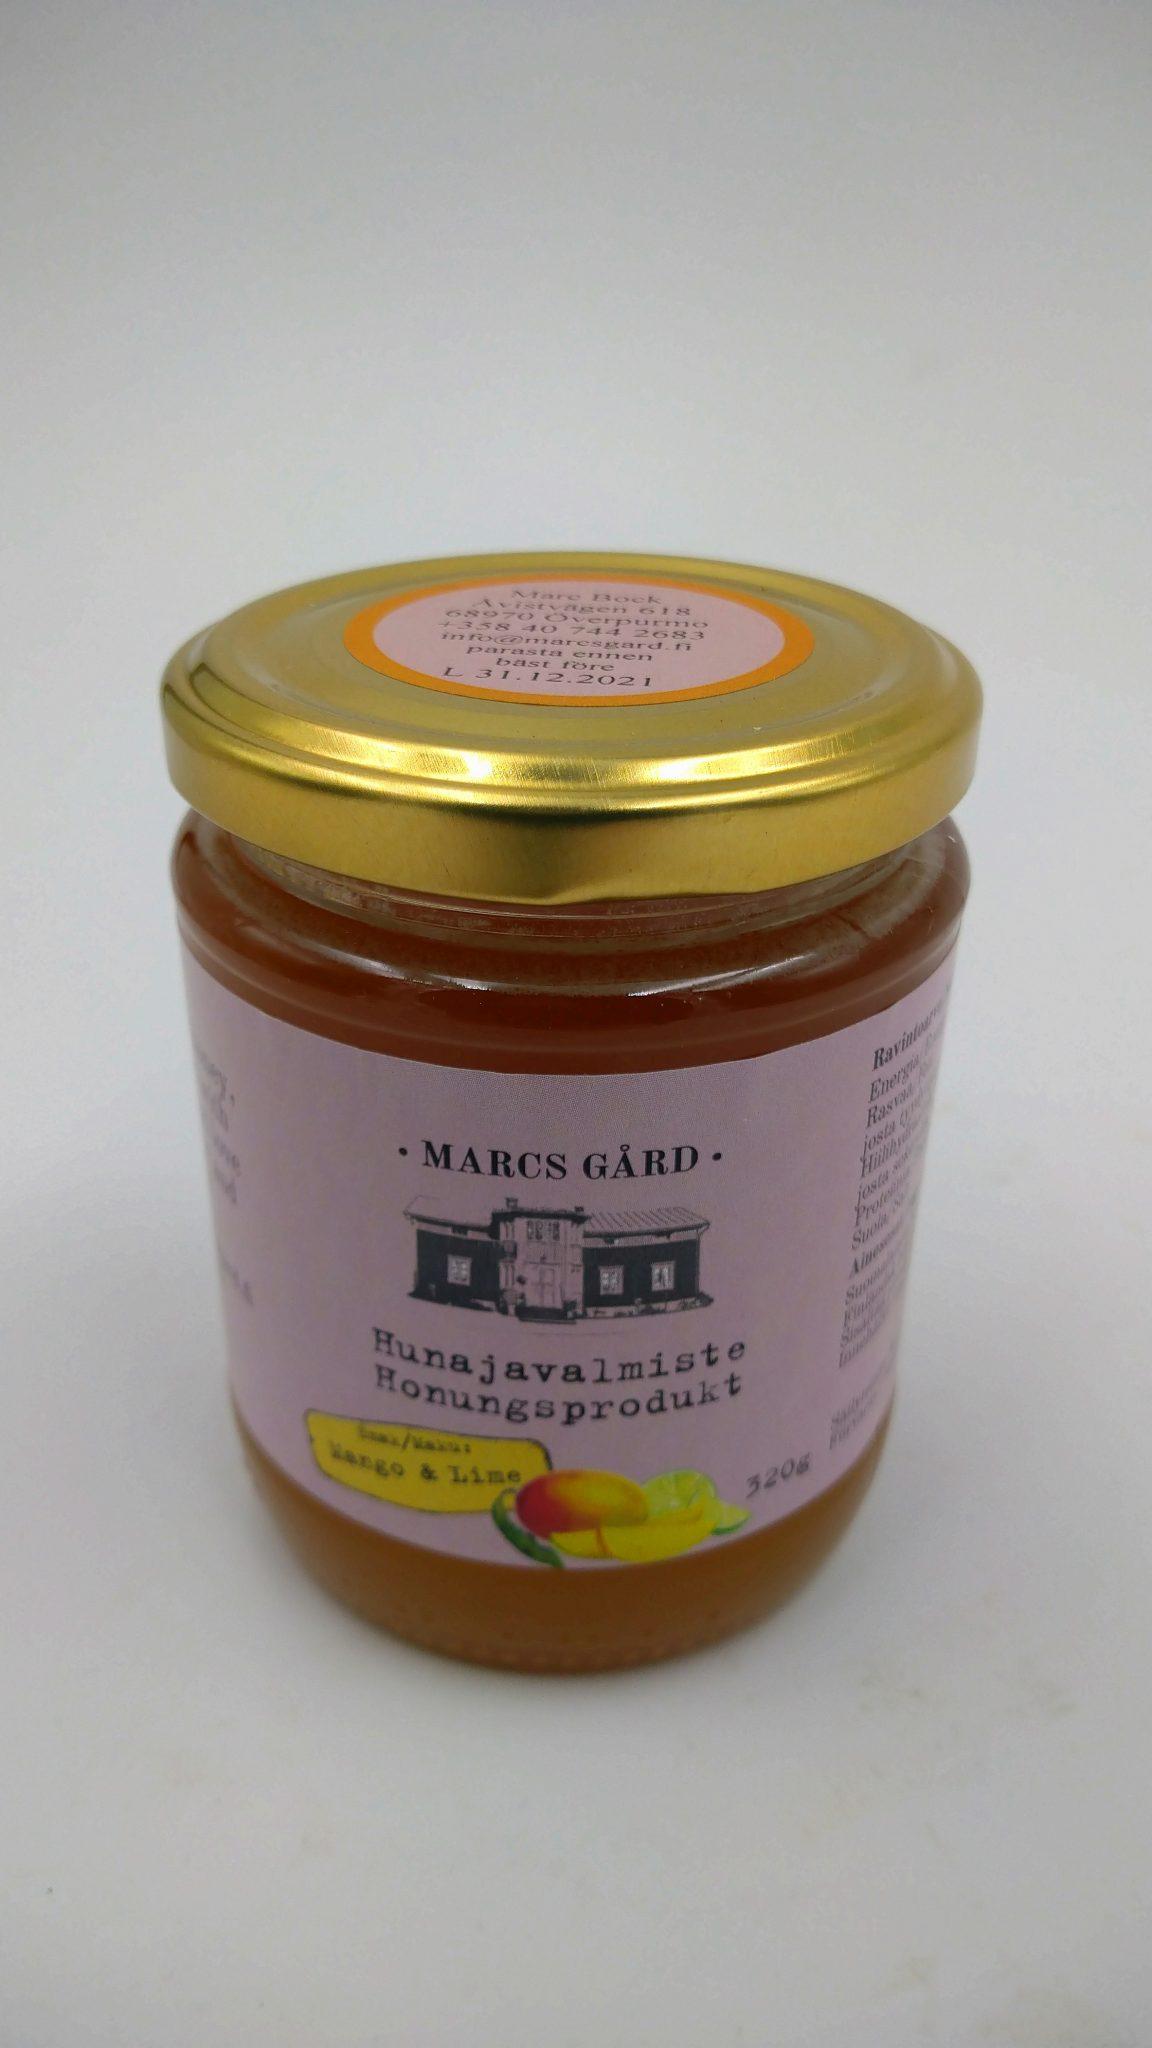 Honungsprodukt, mango & lime